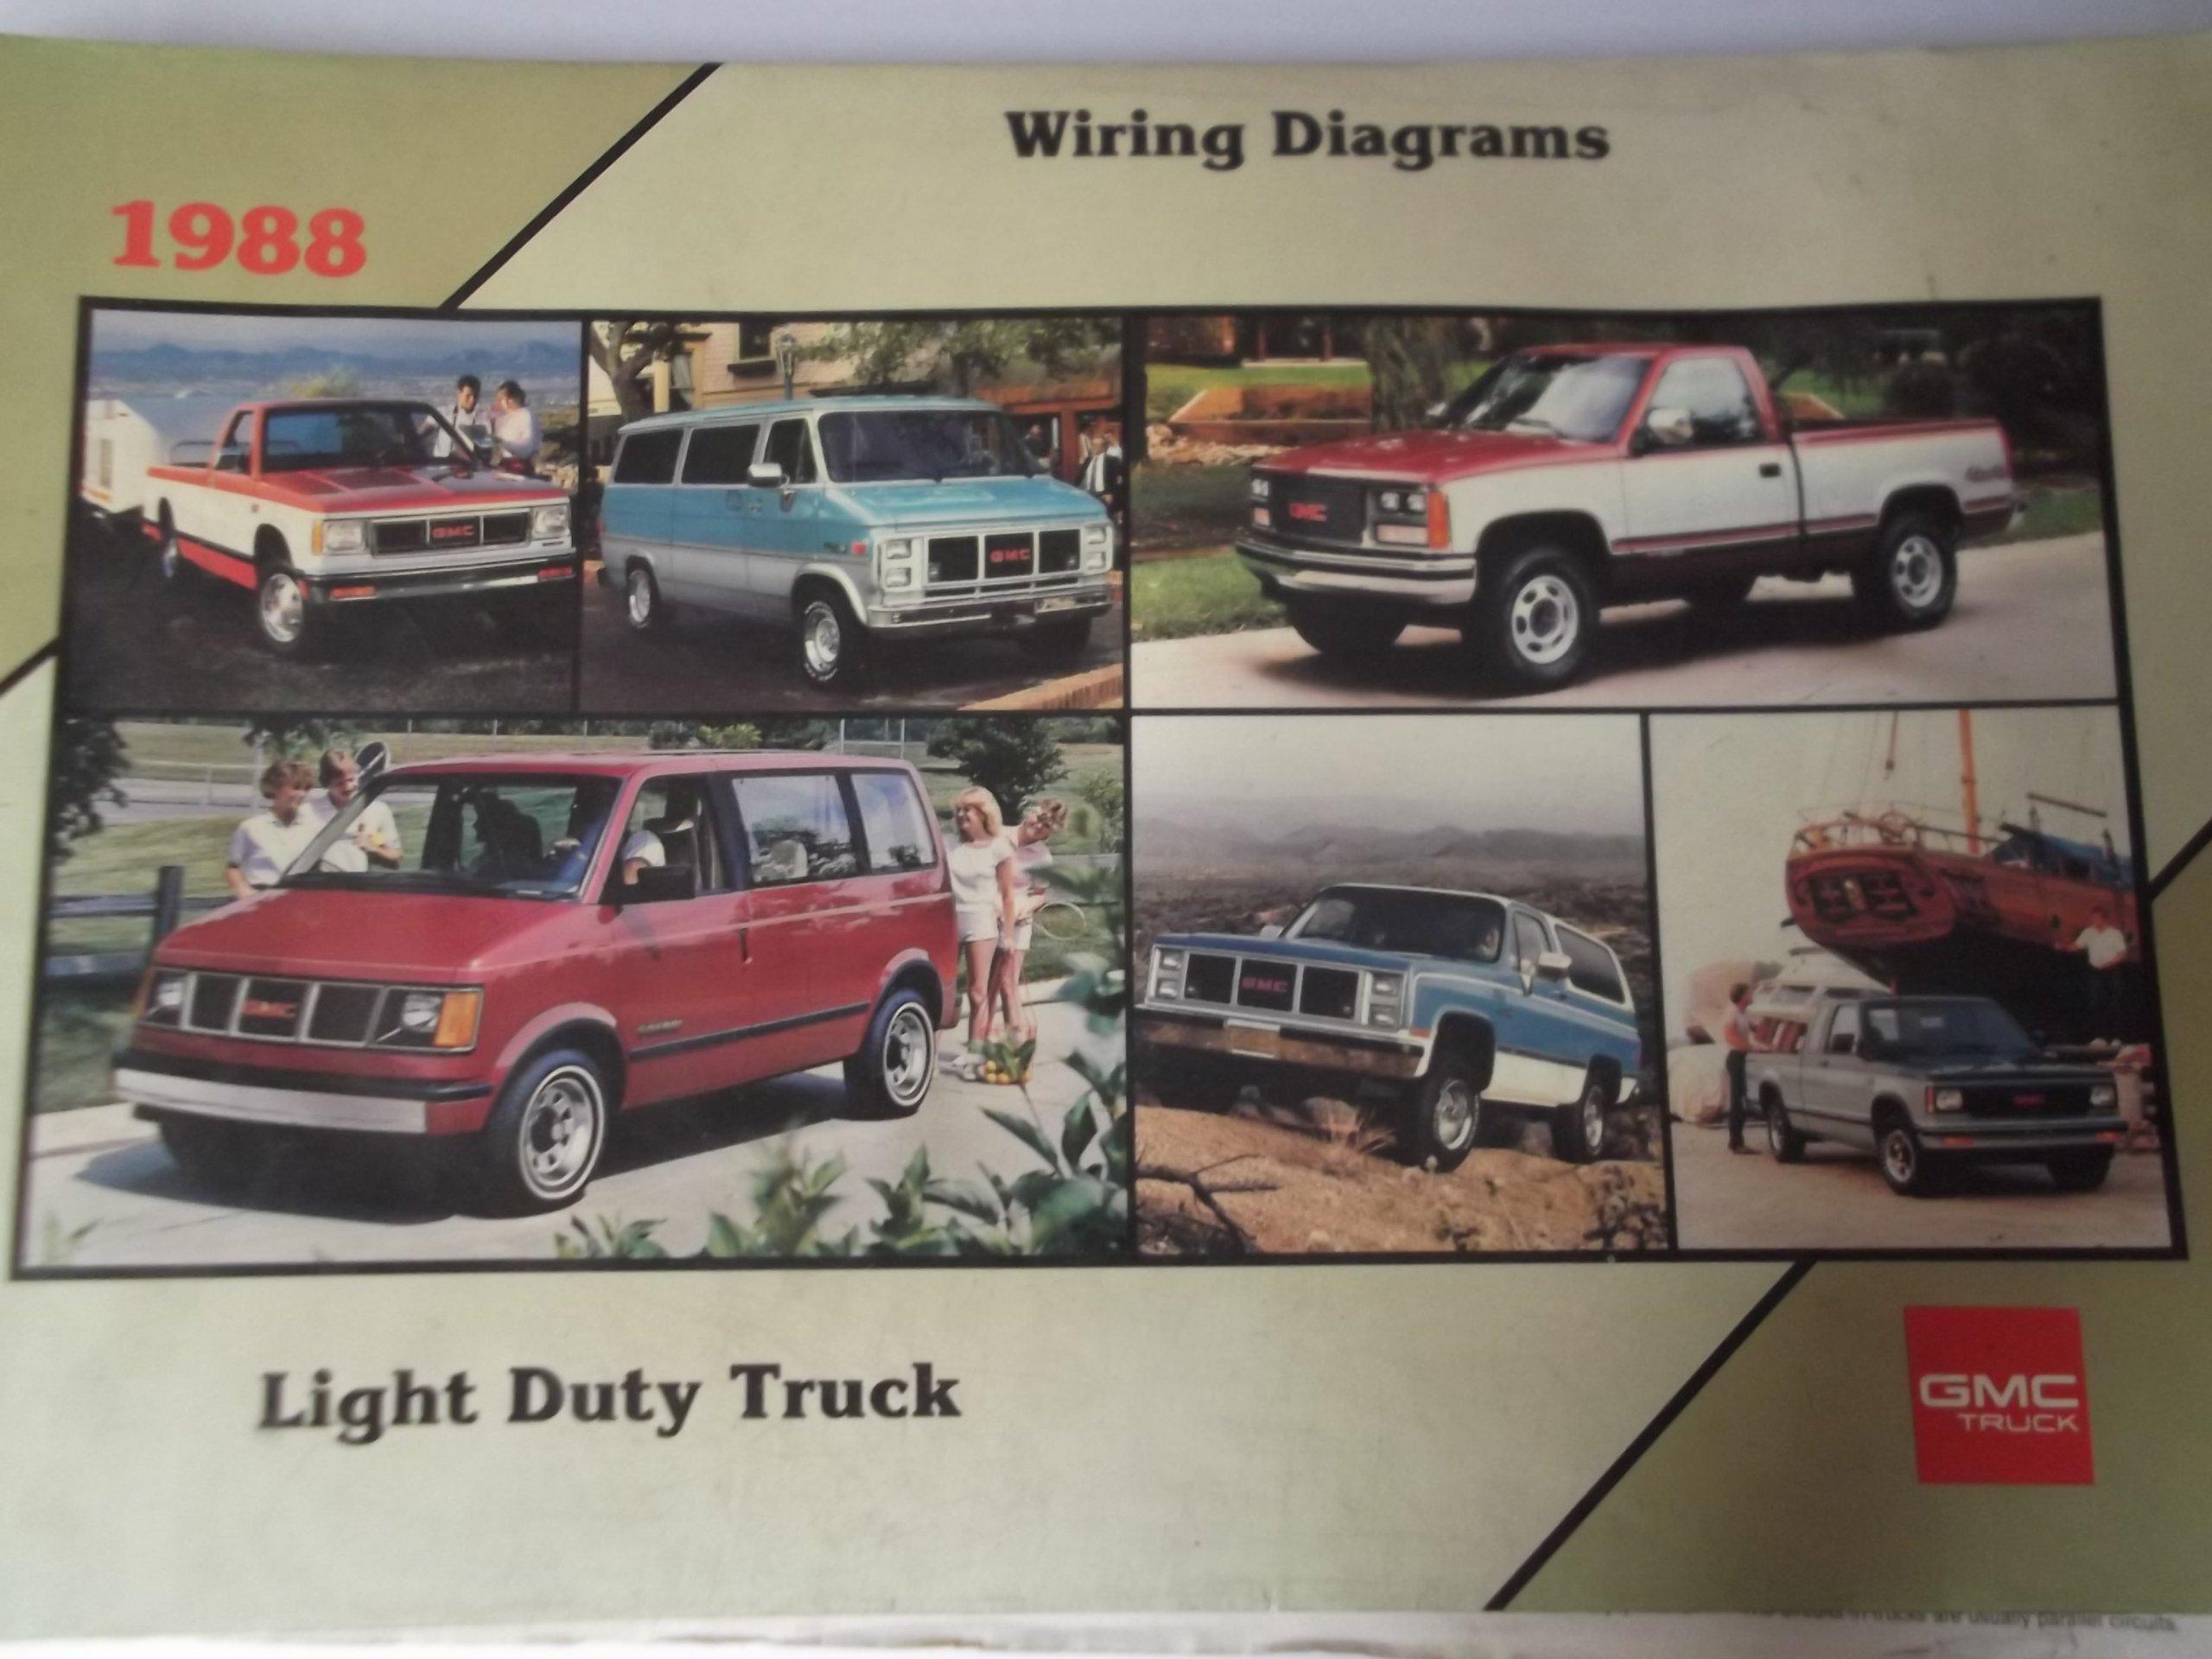 [ANLQ_8698]  GMC Light Duty Truck Wiring Diagrams: 1988: GMC TRUCK DIVISION: Amazon.com:  Books | 1988 Gmc Wiring Diagram |  | Amazon.com